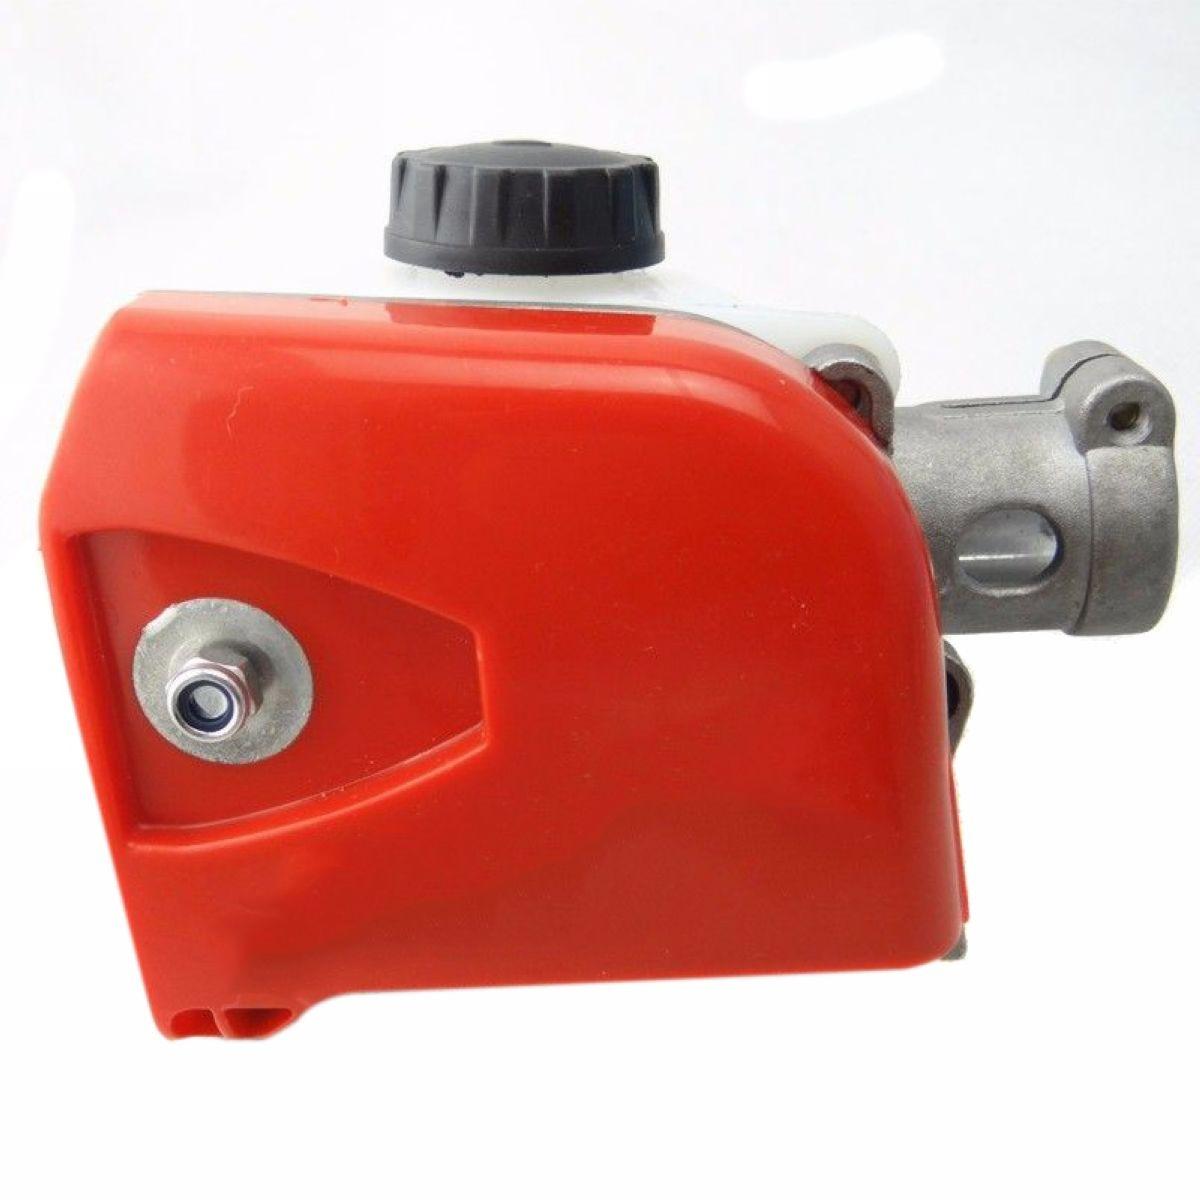 FGHGF 26mm 7 Spline Top 9 Spline Pole saw Tree Cutter Chainsaw Gearbox Gear head Tools Orange&White